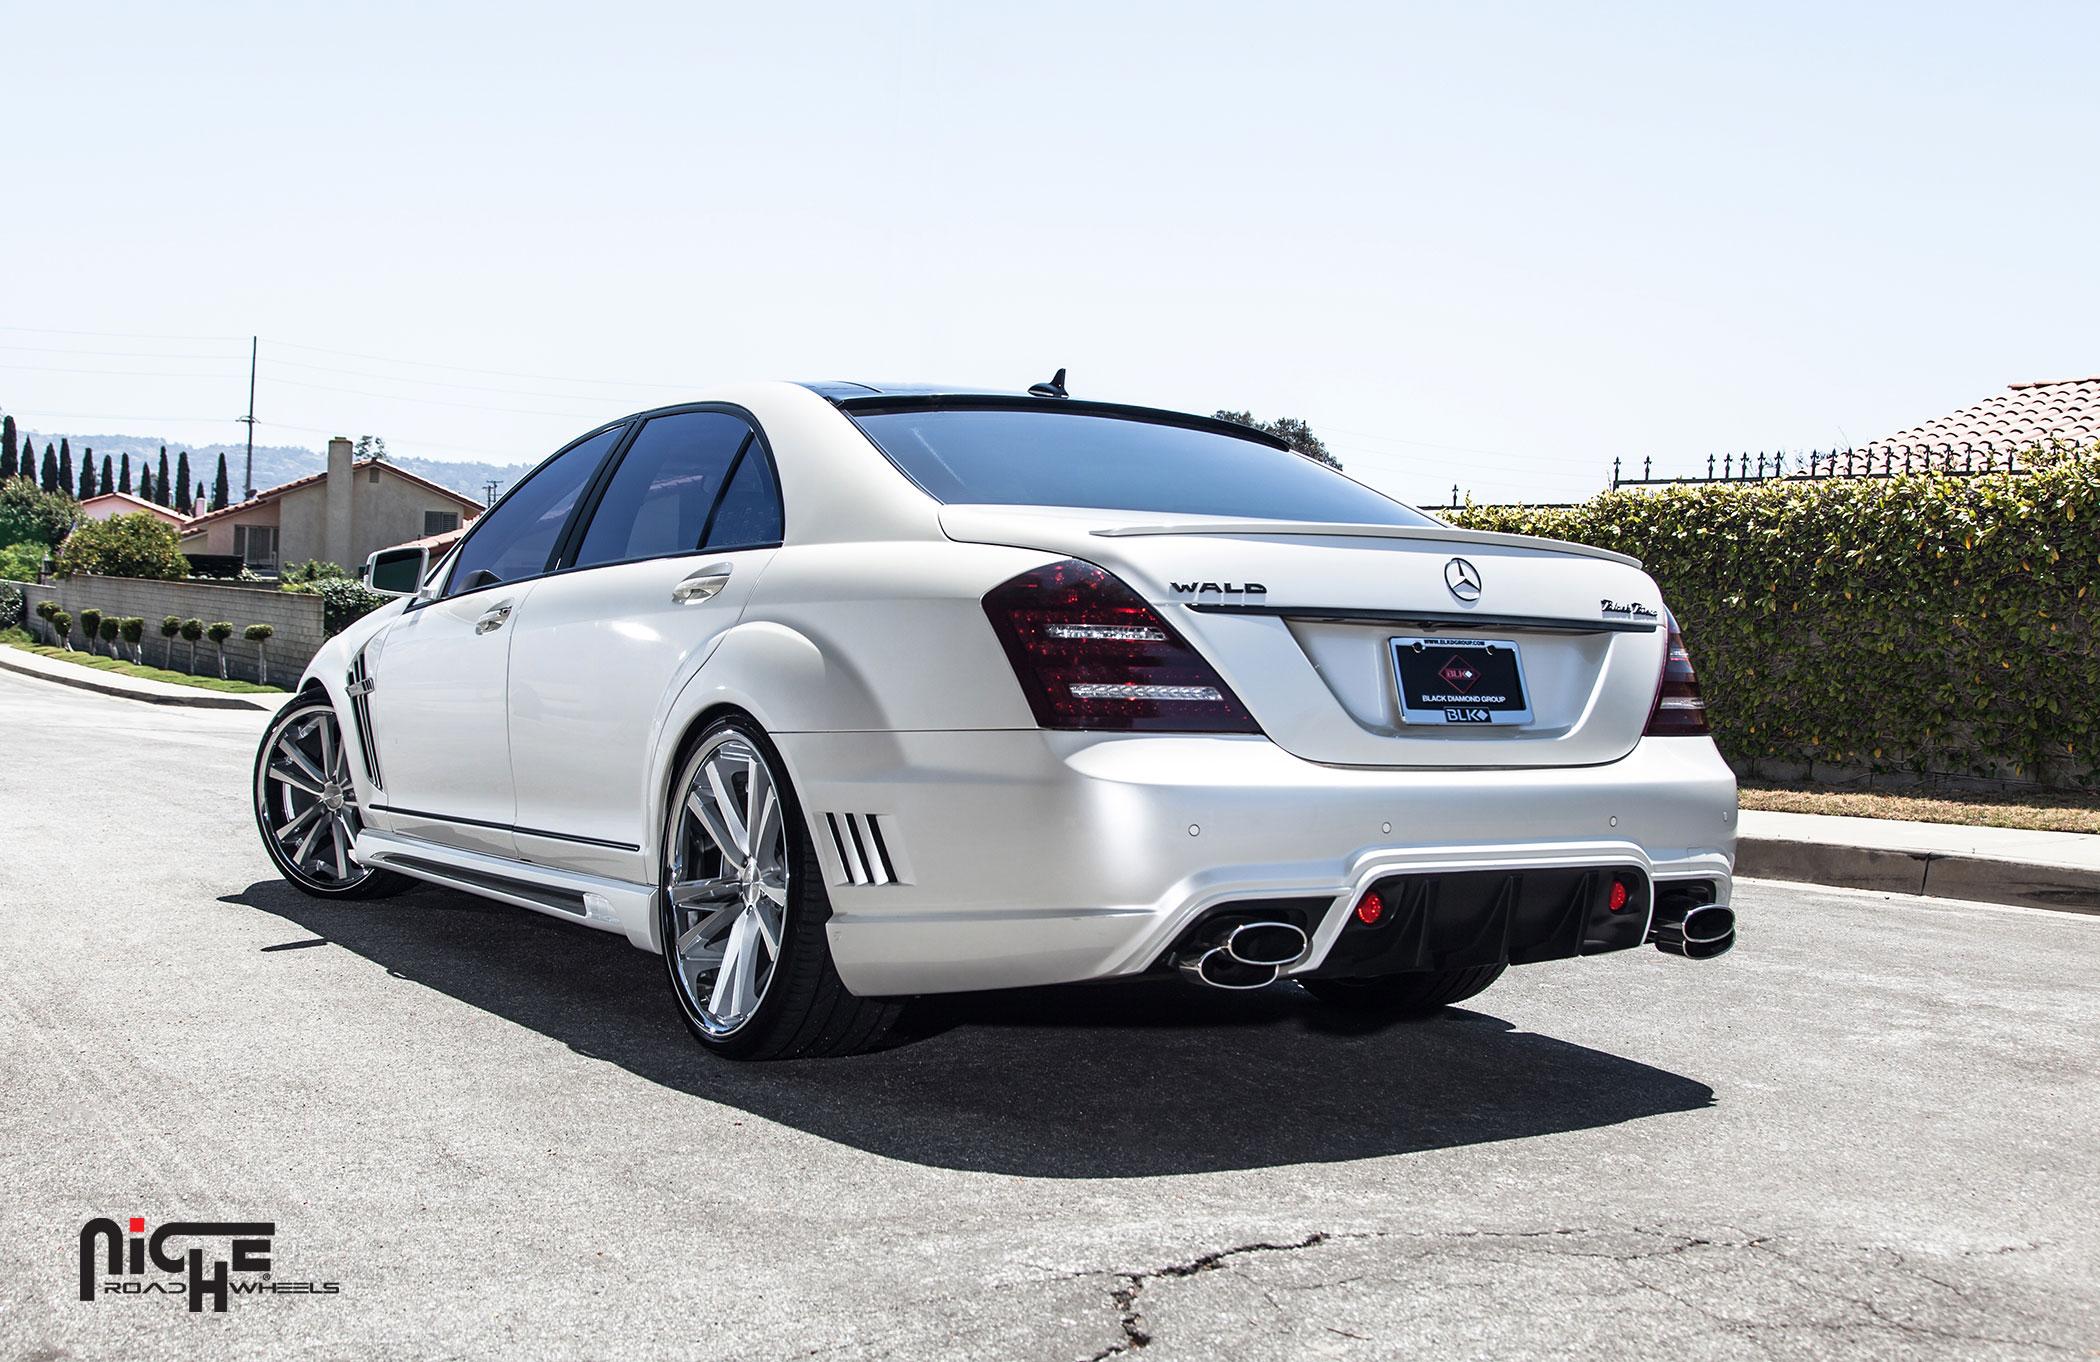 Mercedes benz s550 gallery mht wheels inc for Mercedes benz rim